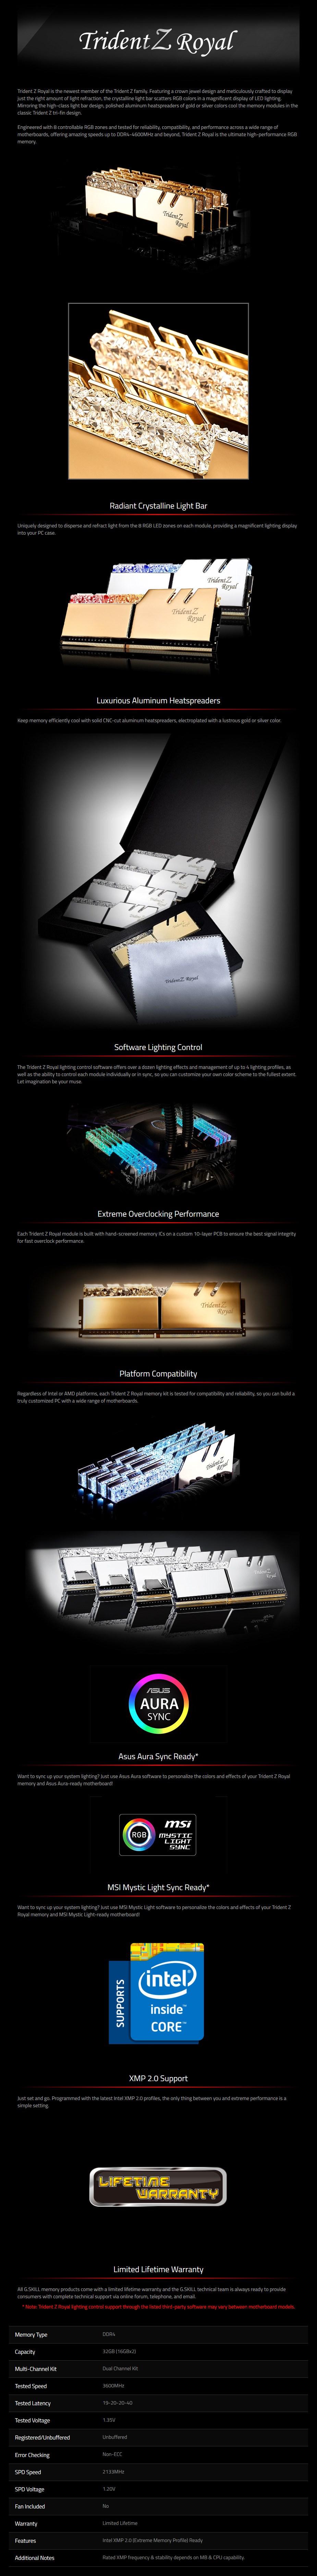 G.SKill Trident Z RGB Royal 32GB (2x 16GB) DDR4 CL19 3600MHz Memory - Gold - Desktop Overview 1